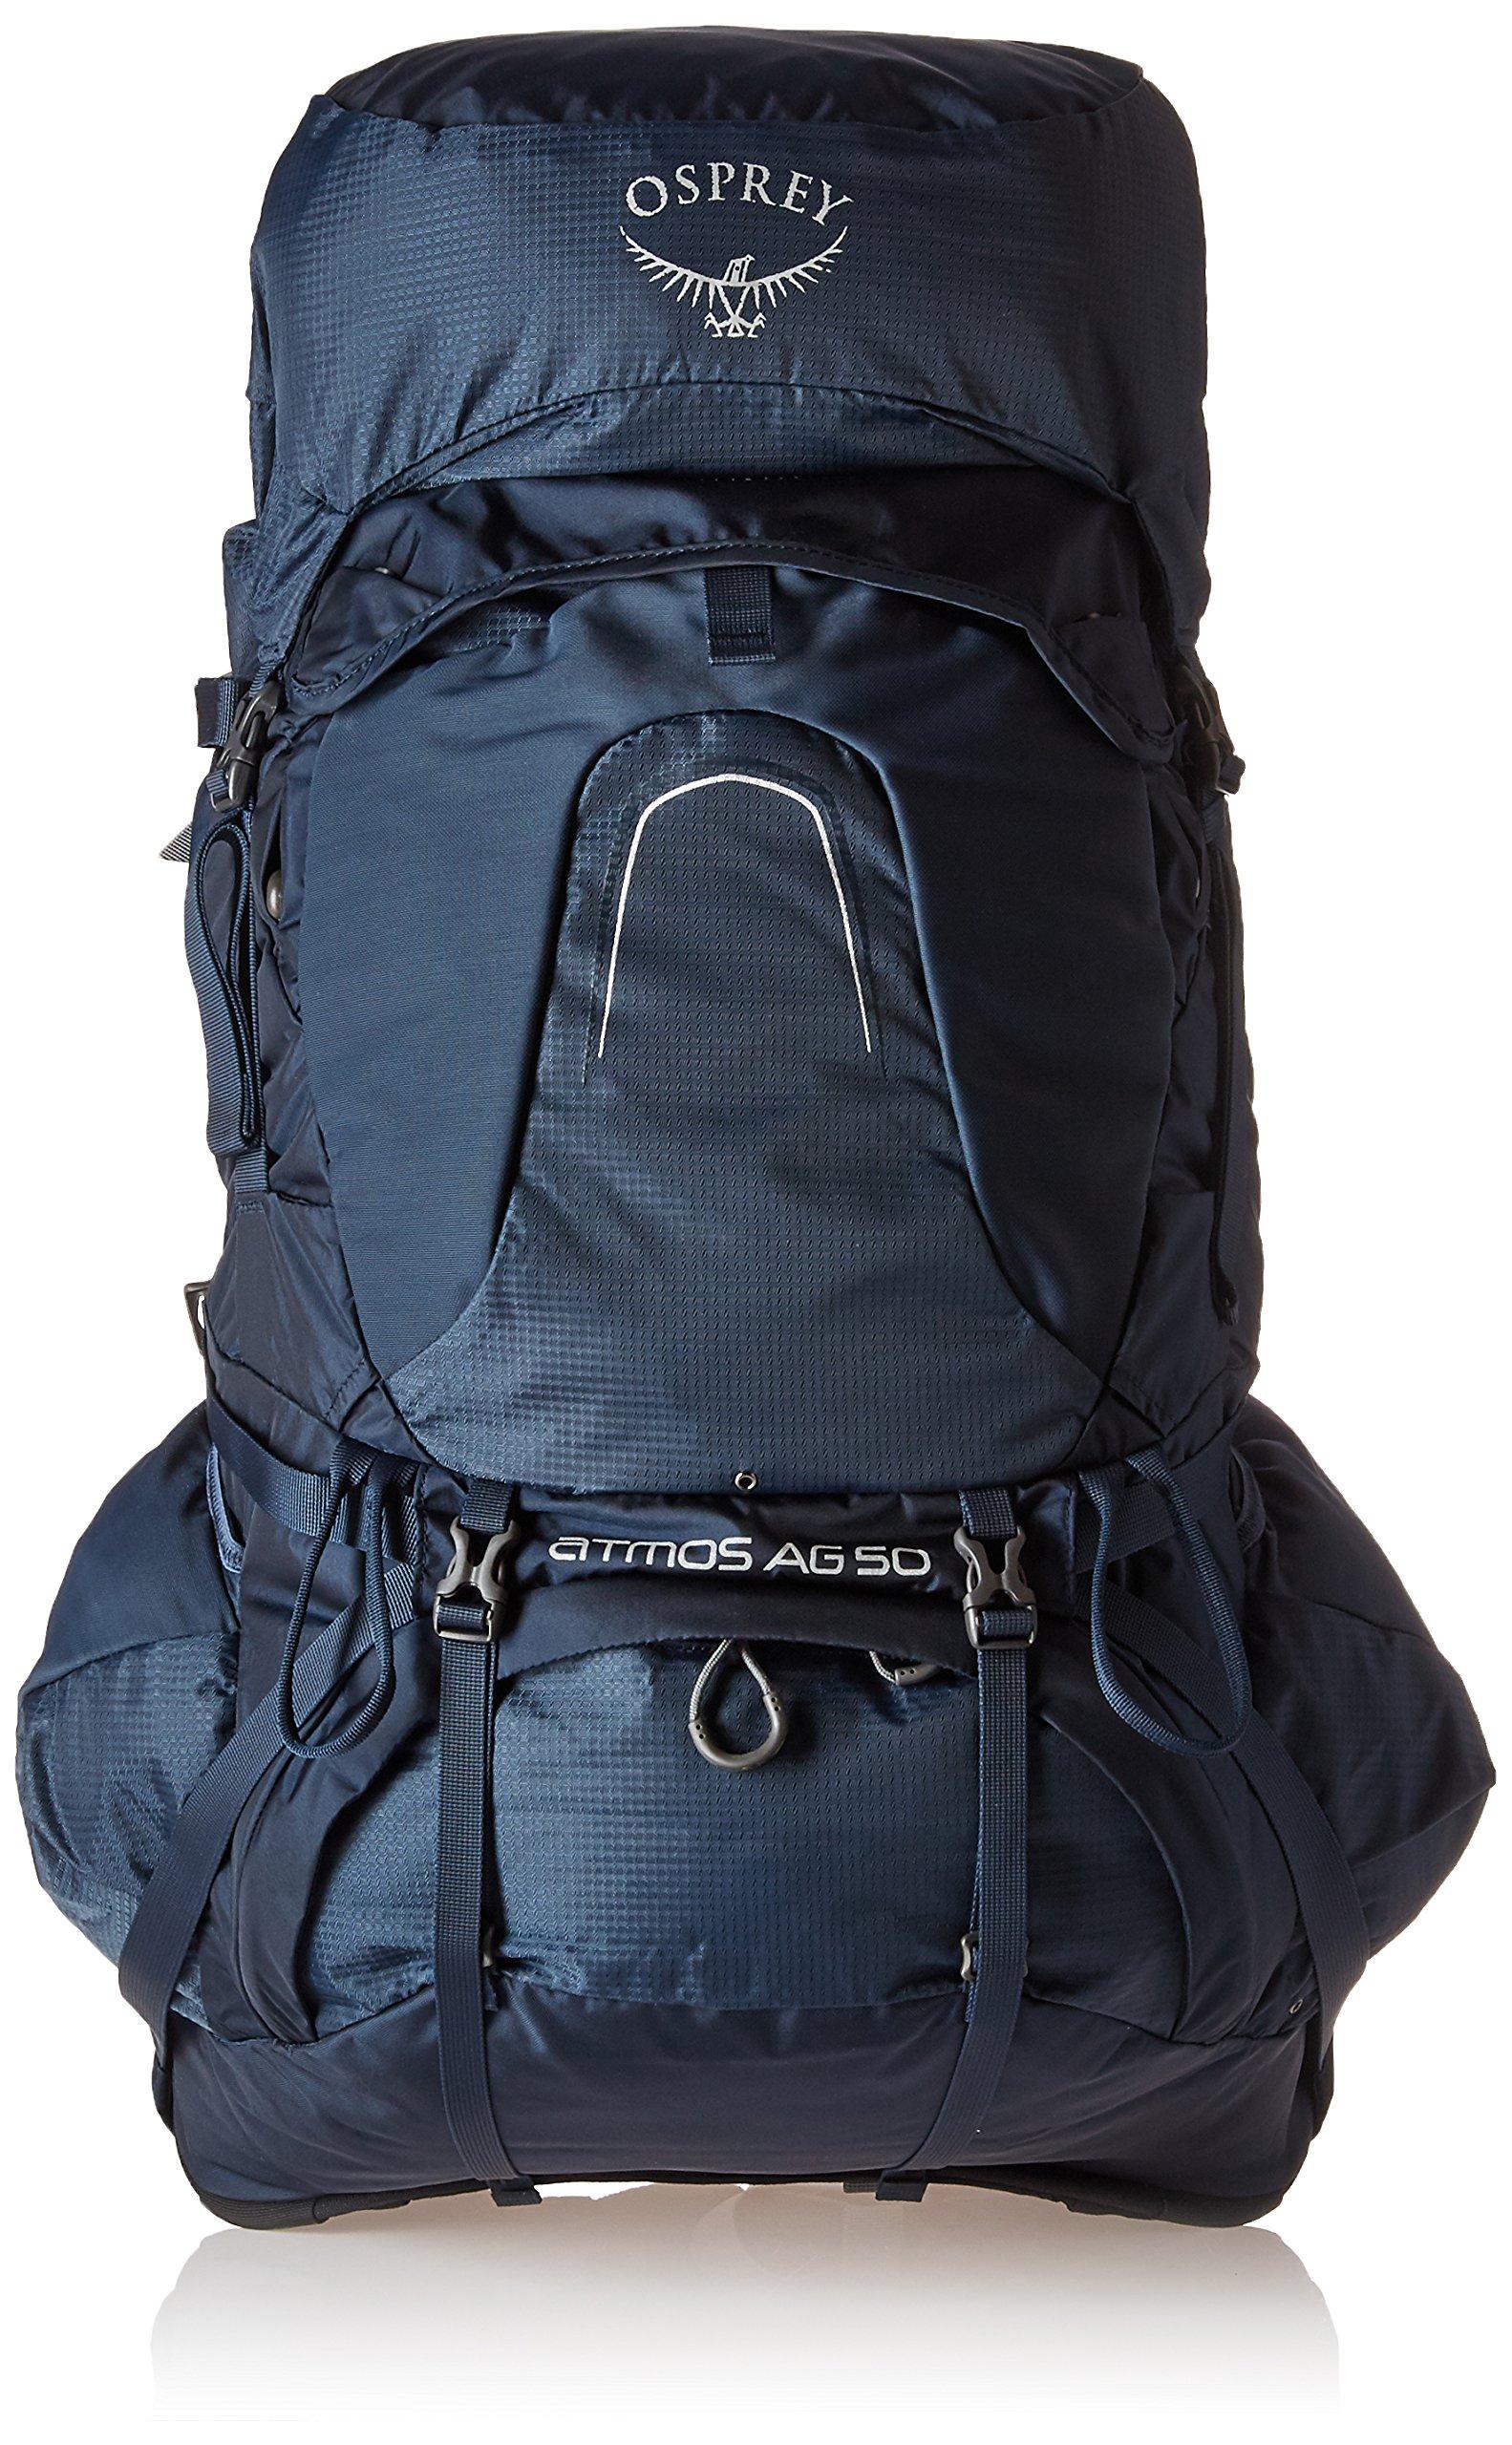 Osprey Packs Atmos Ag 50 Backpacking Pack, Unity Blue, Medium